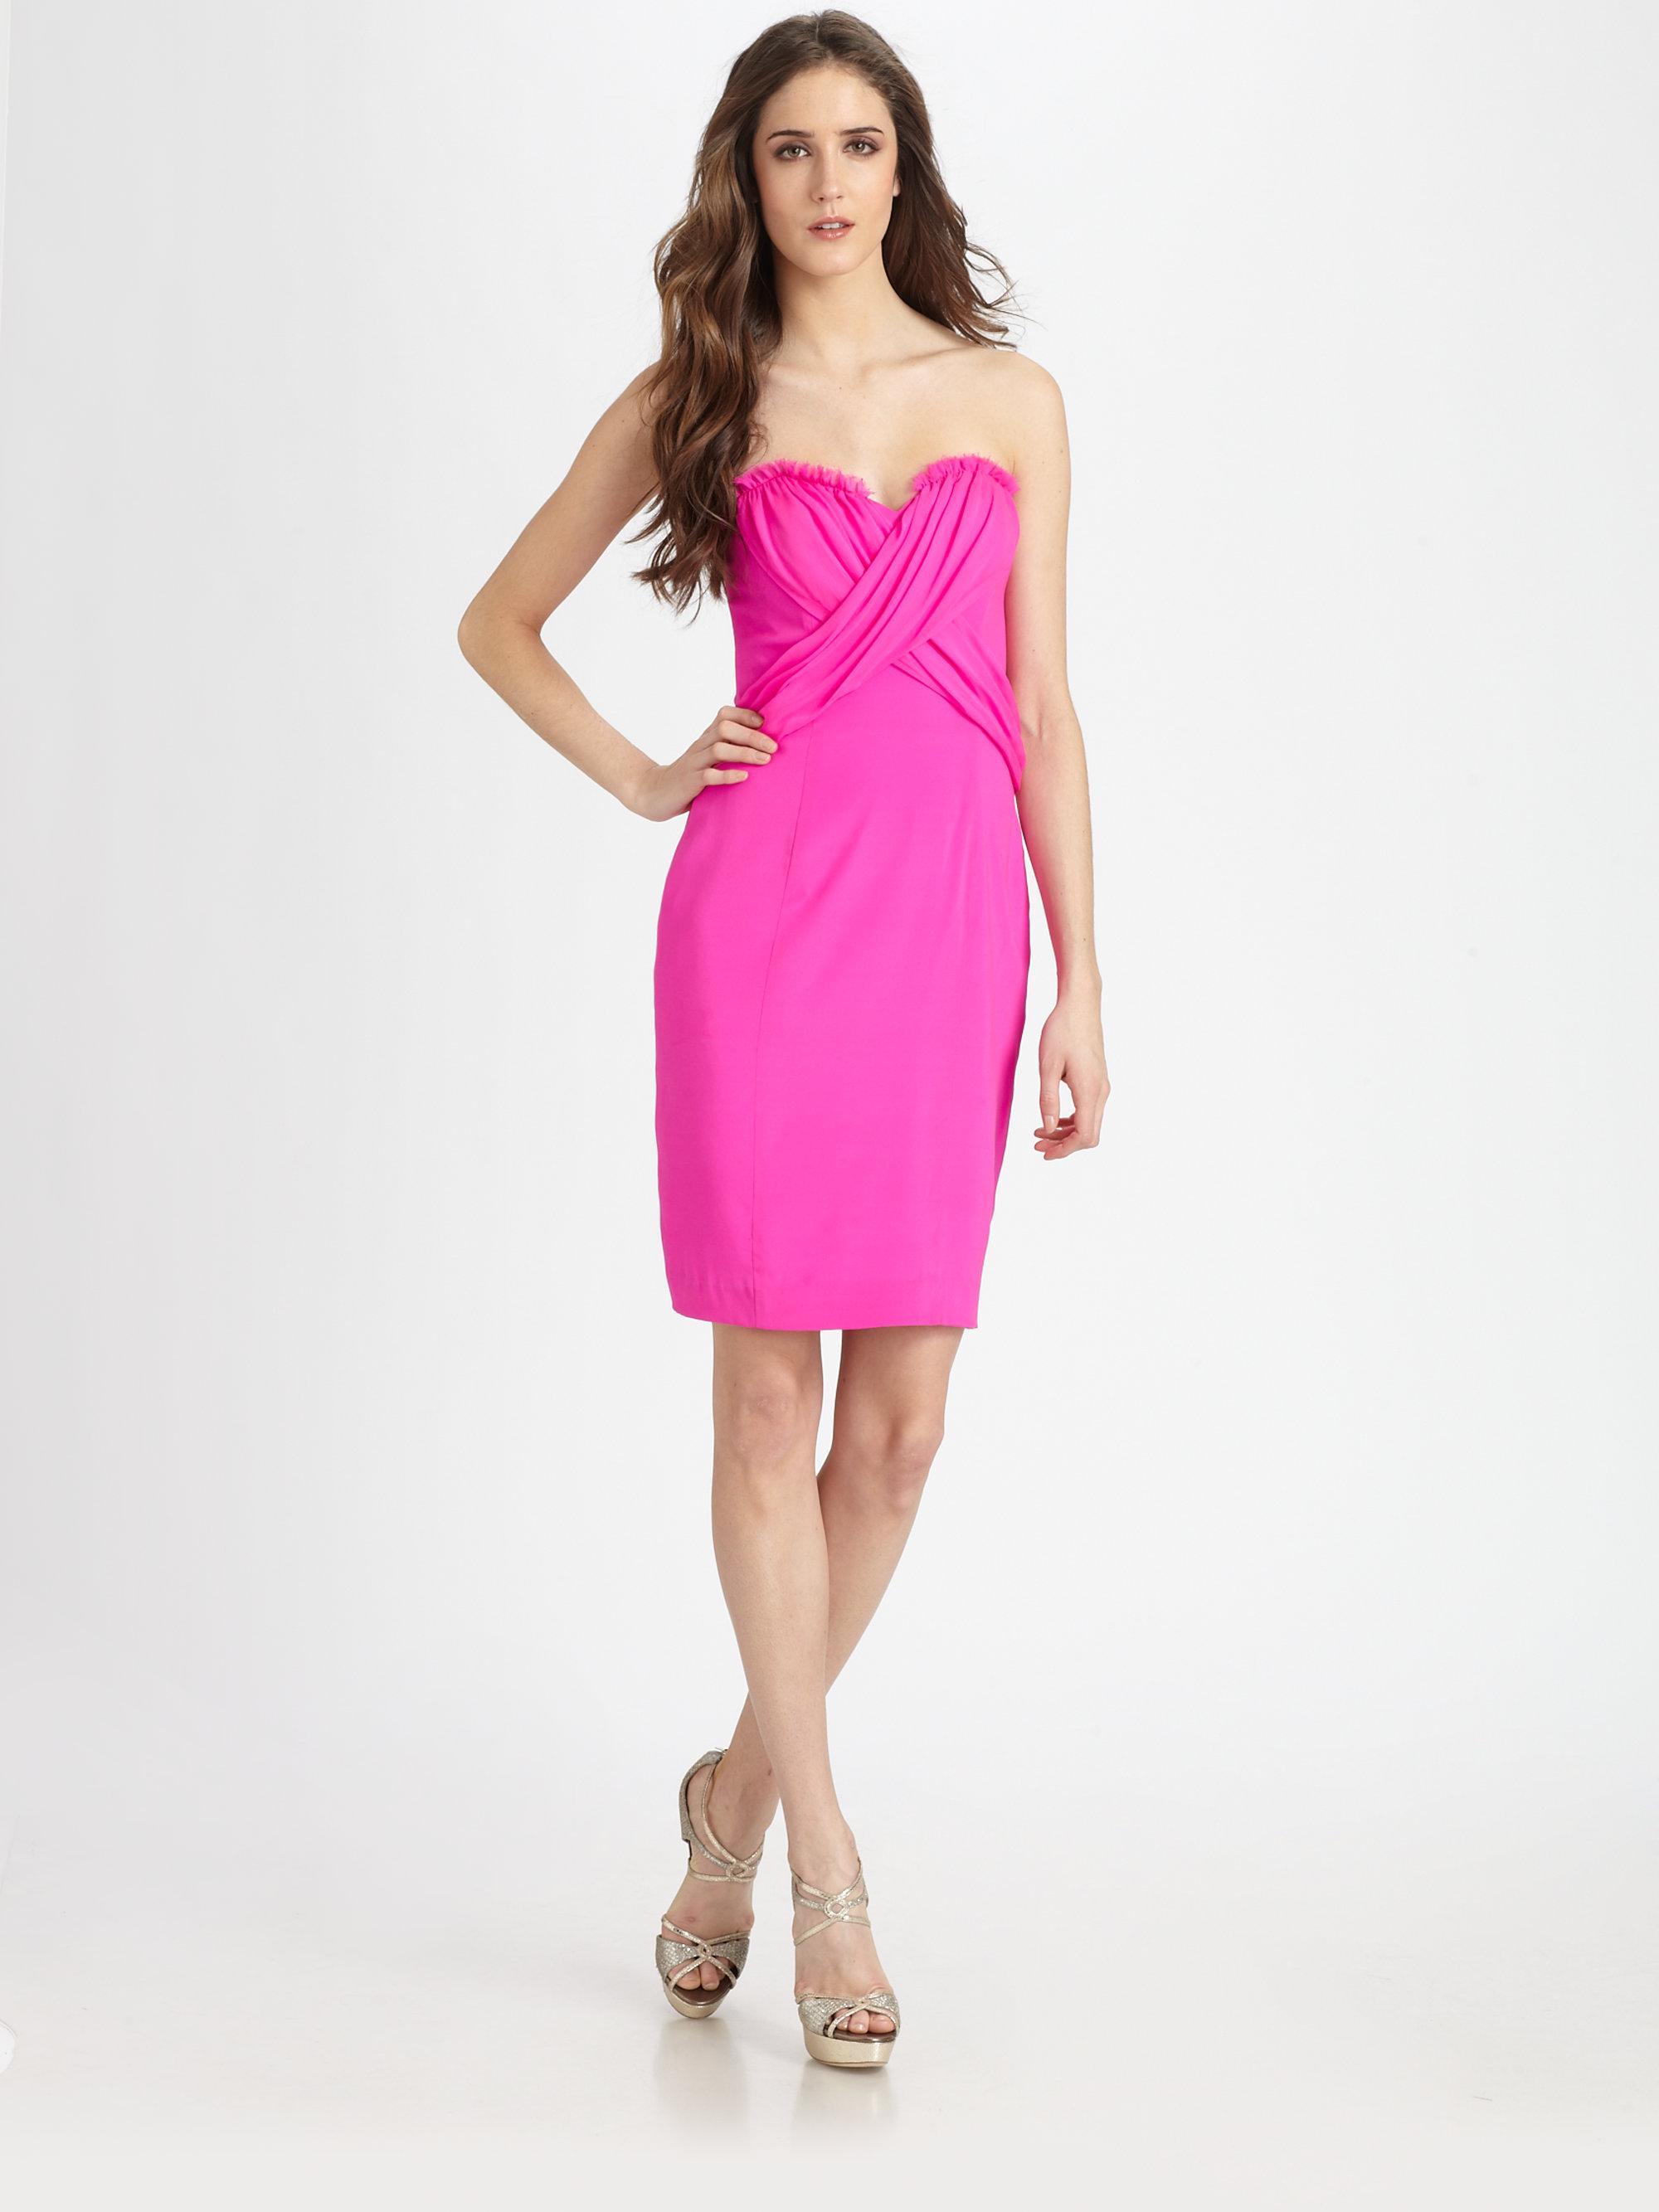 Jay godfrey Silk Strapless Dress in Pink | Lyst